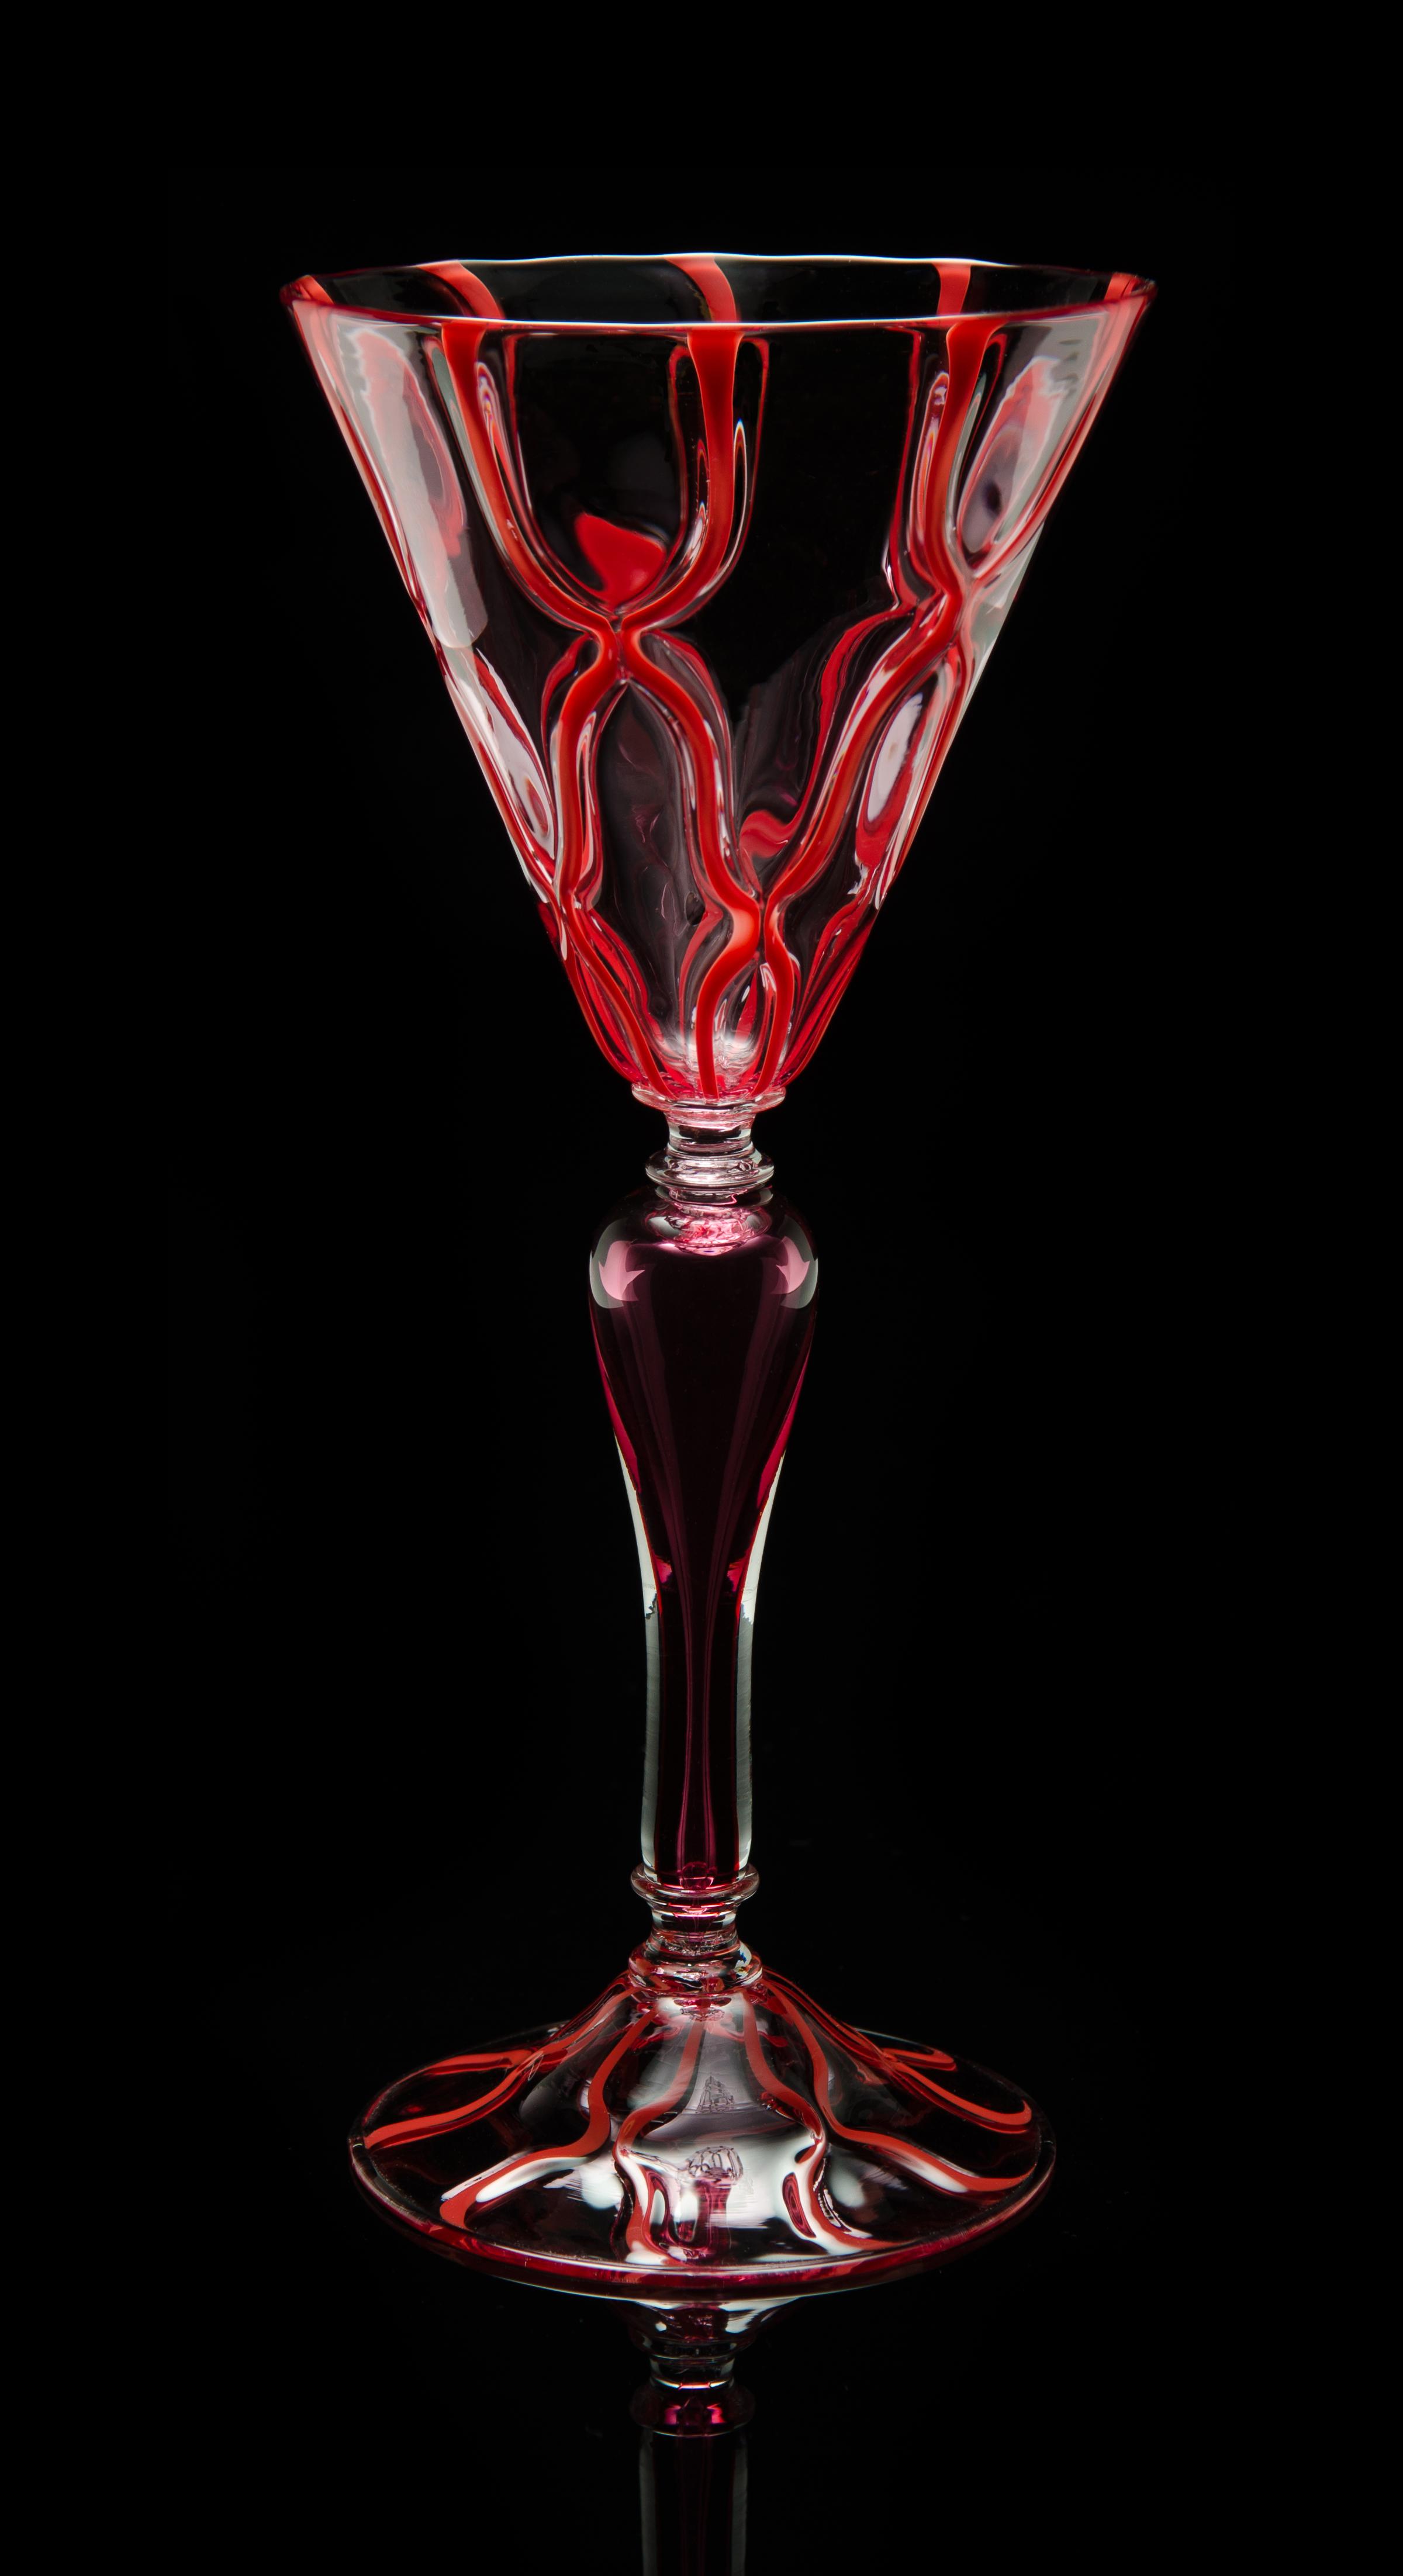 Lino Tagliapietra, Goblet (1991-1994, glass, 9 11/16 x 4 1/4 x 4 1/4 inches), LT.20